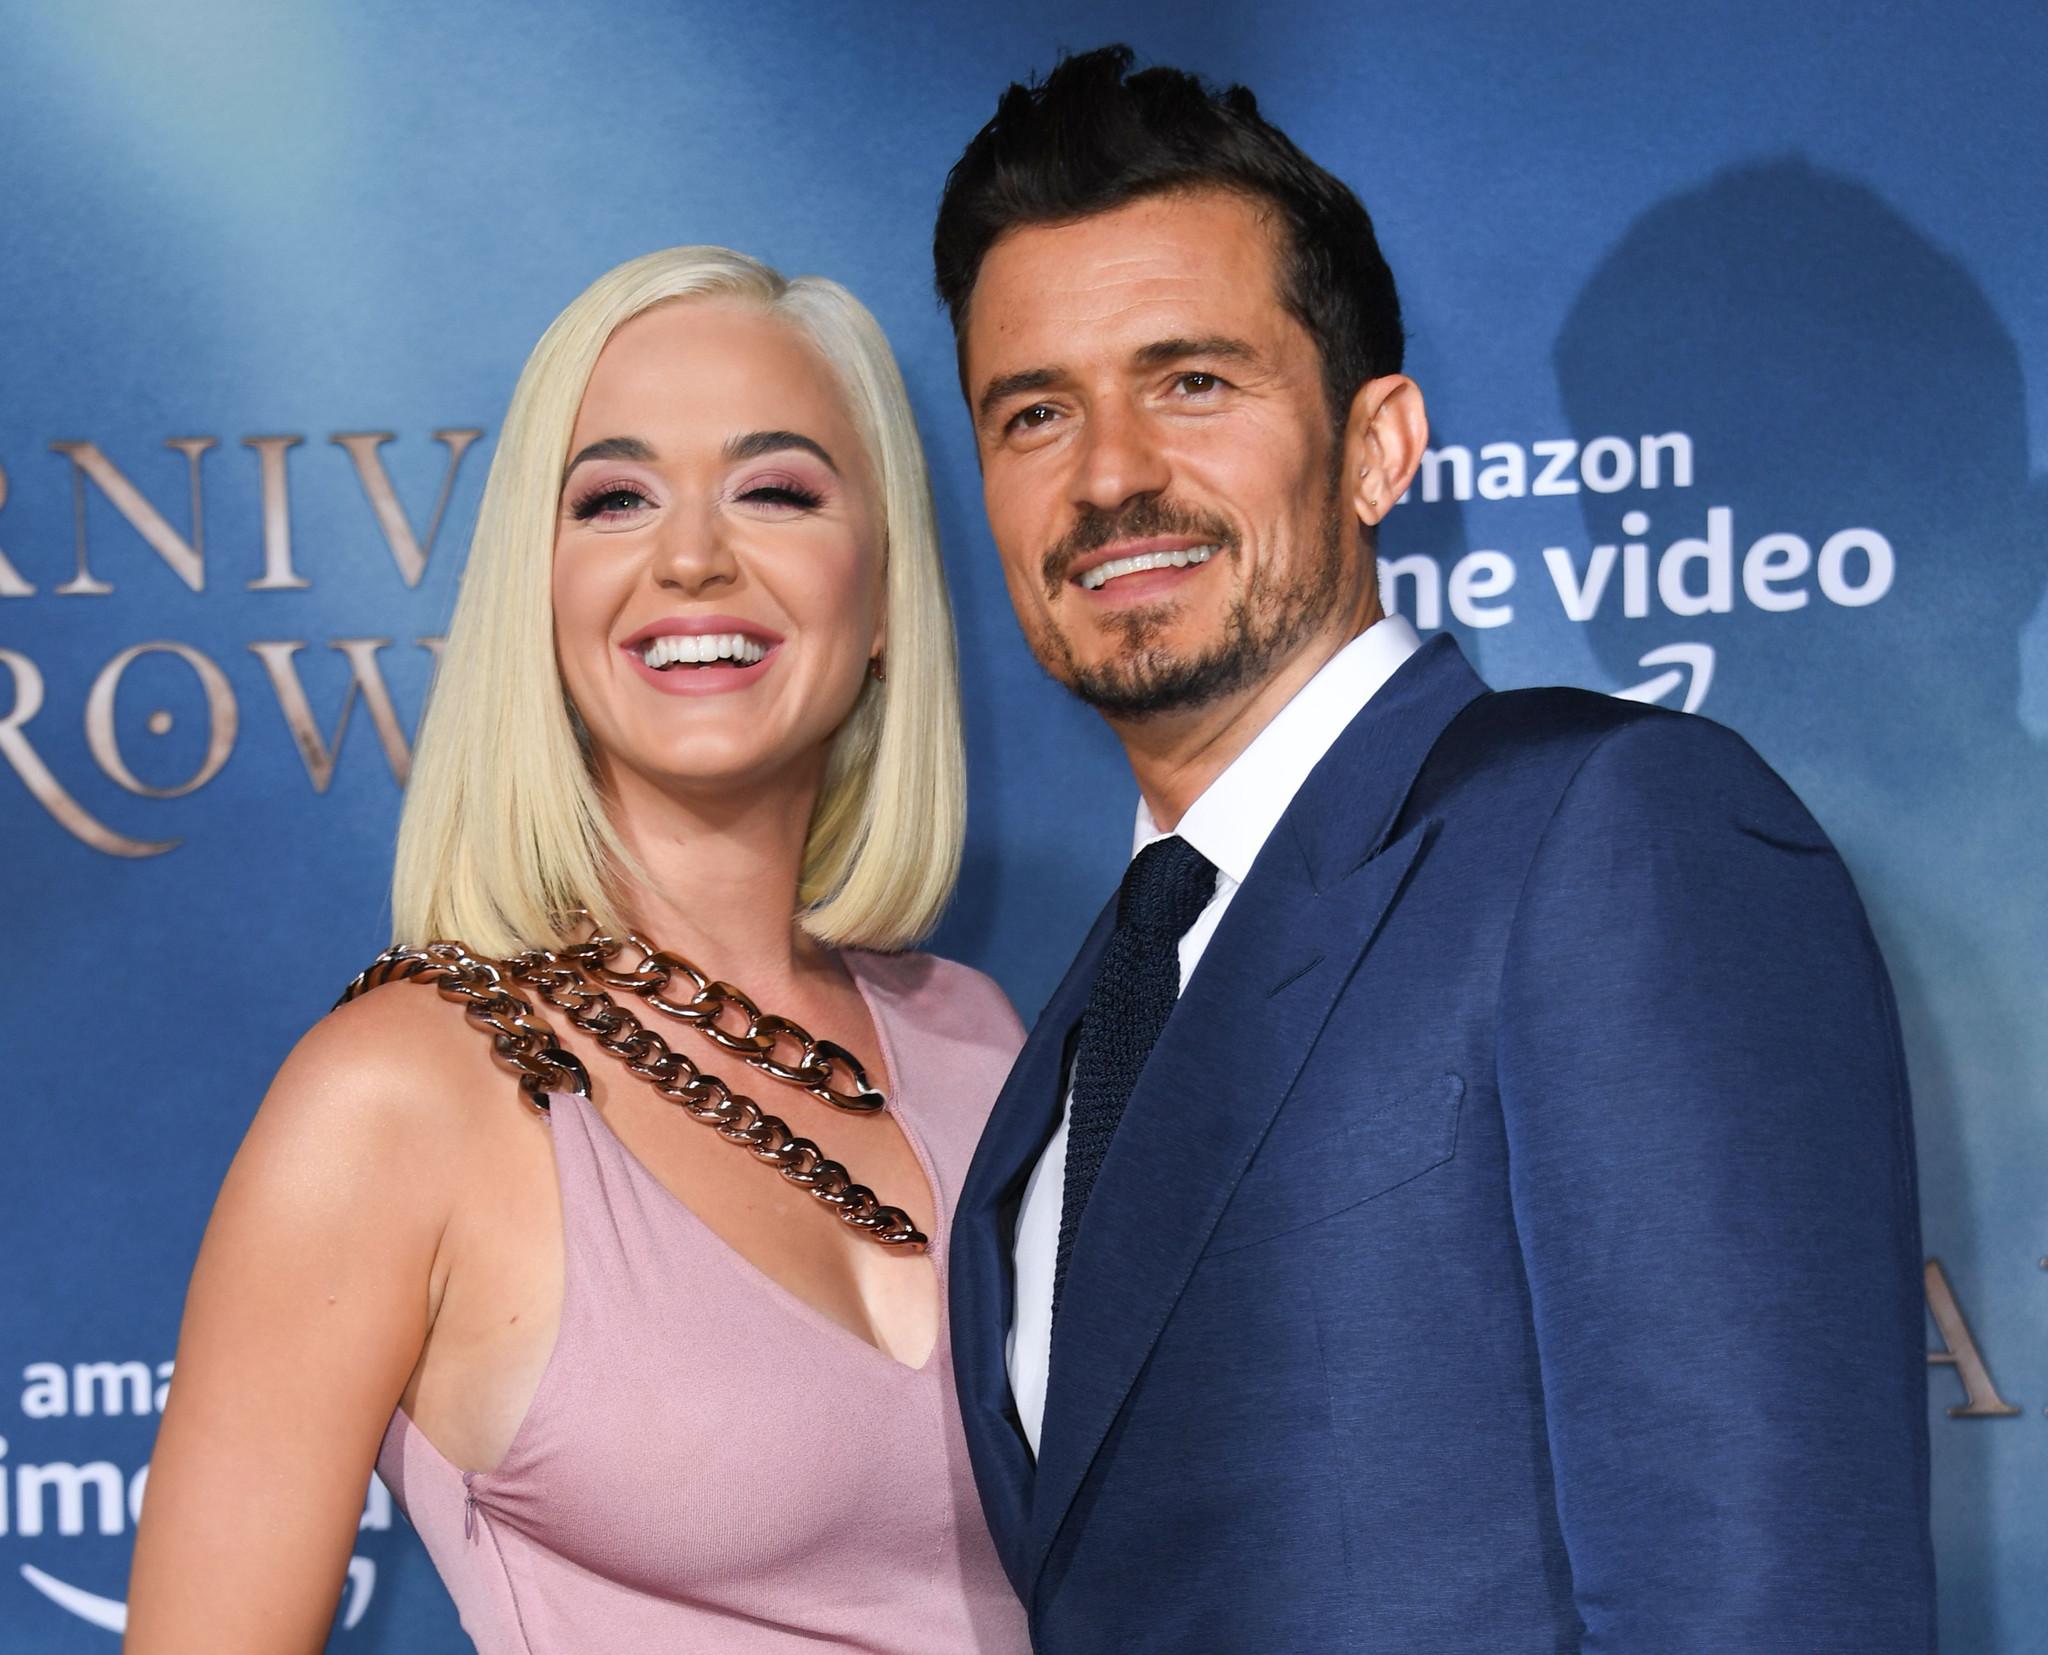 Katy Perry shares sappy birthday post for fiancé Orlando Bloom